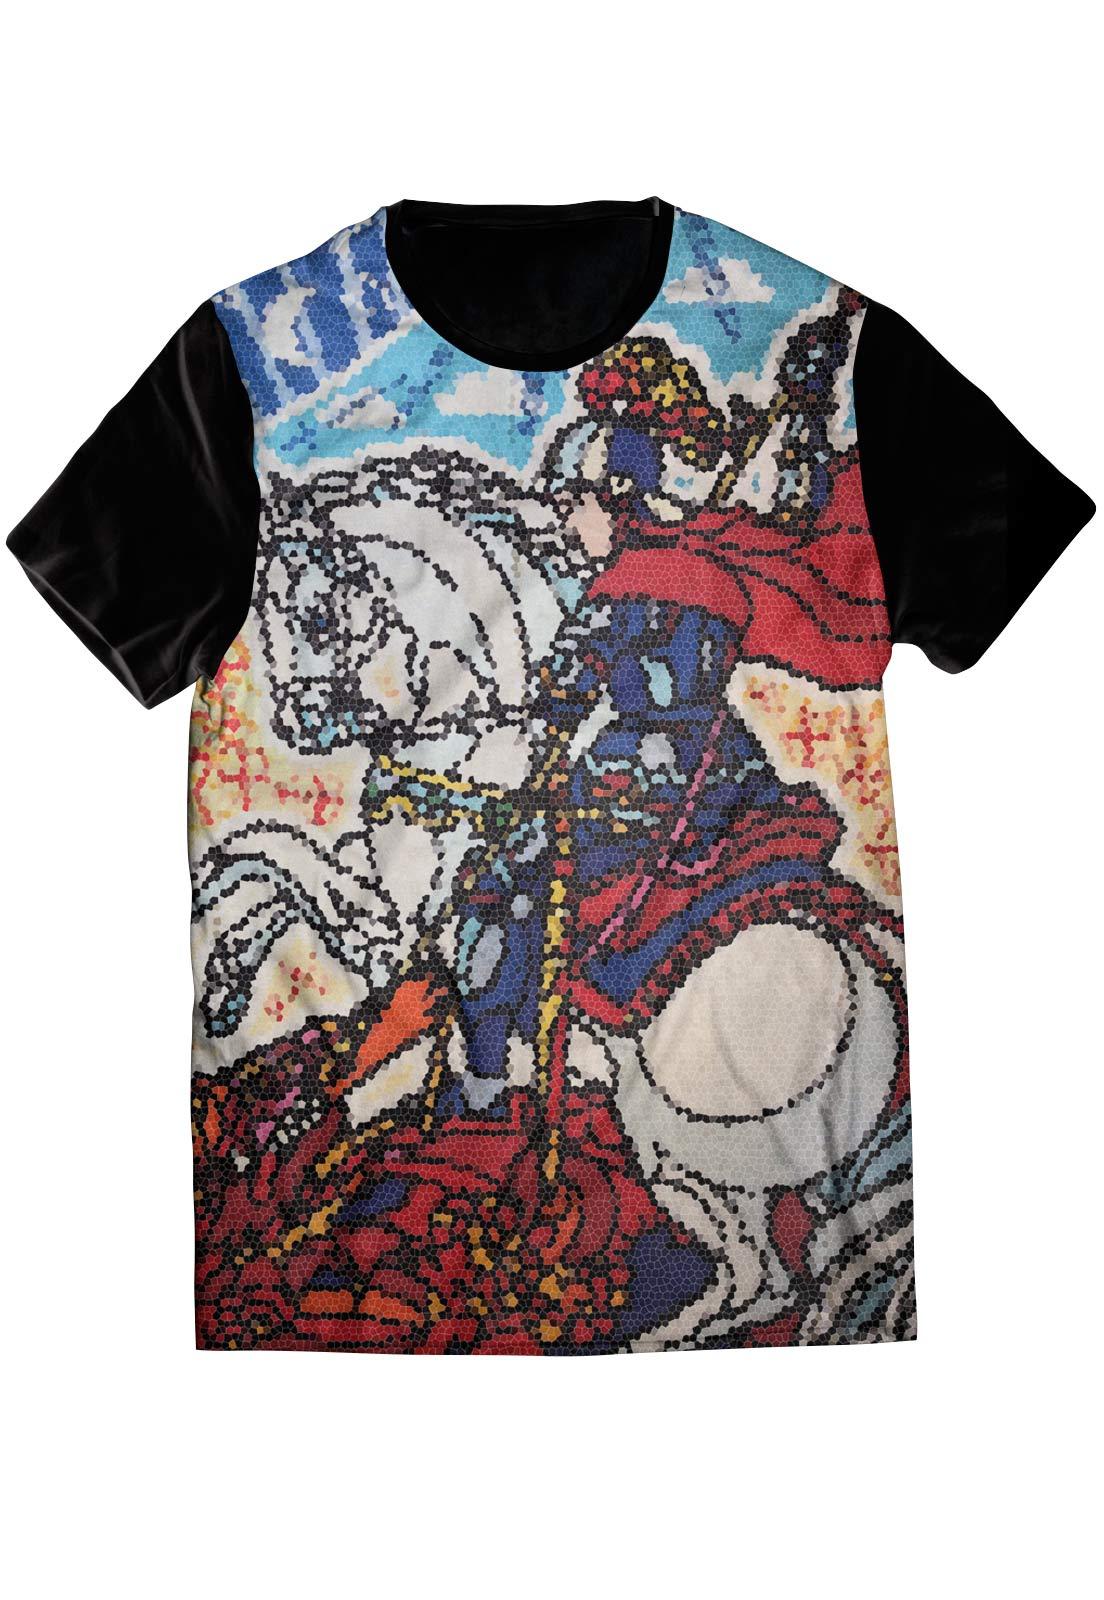 Camiseta ElephunK Estampada São Jorge Ologum Preta